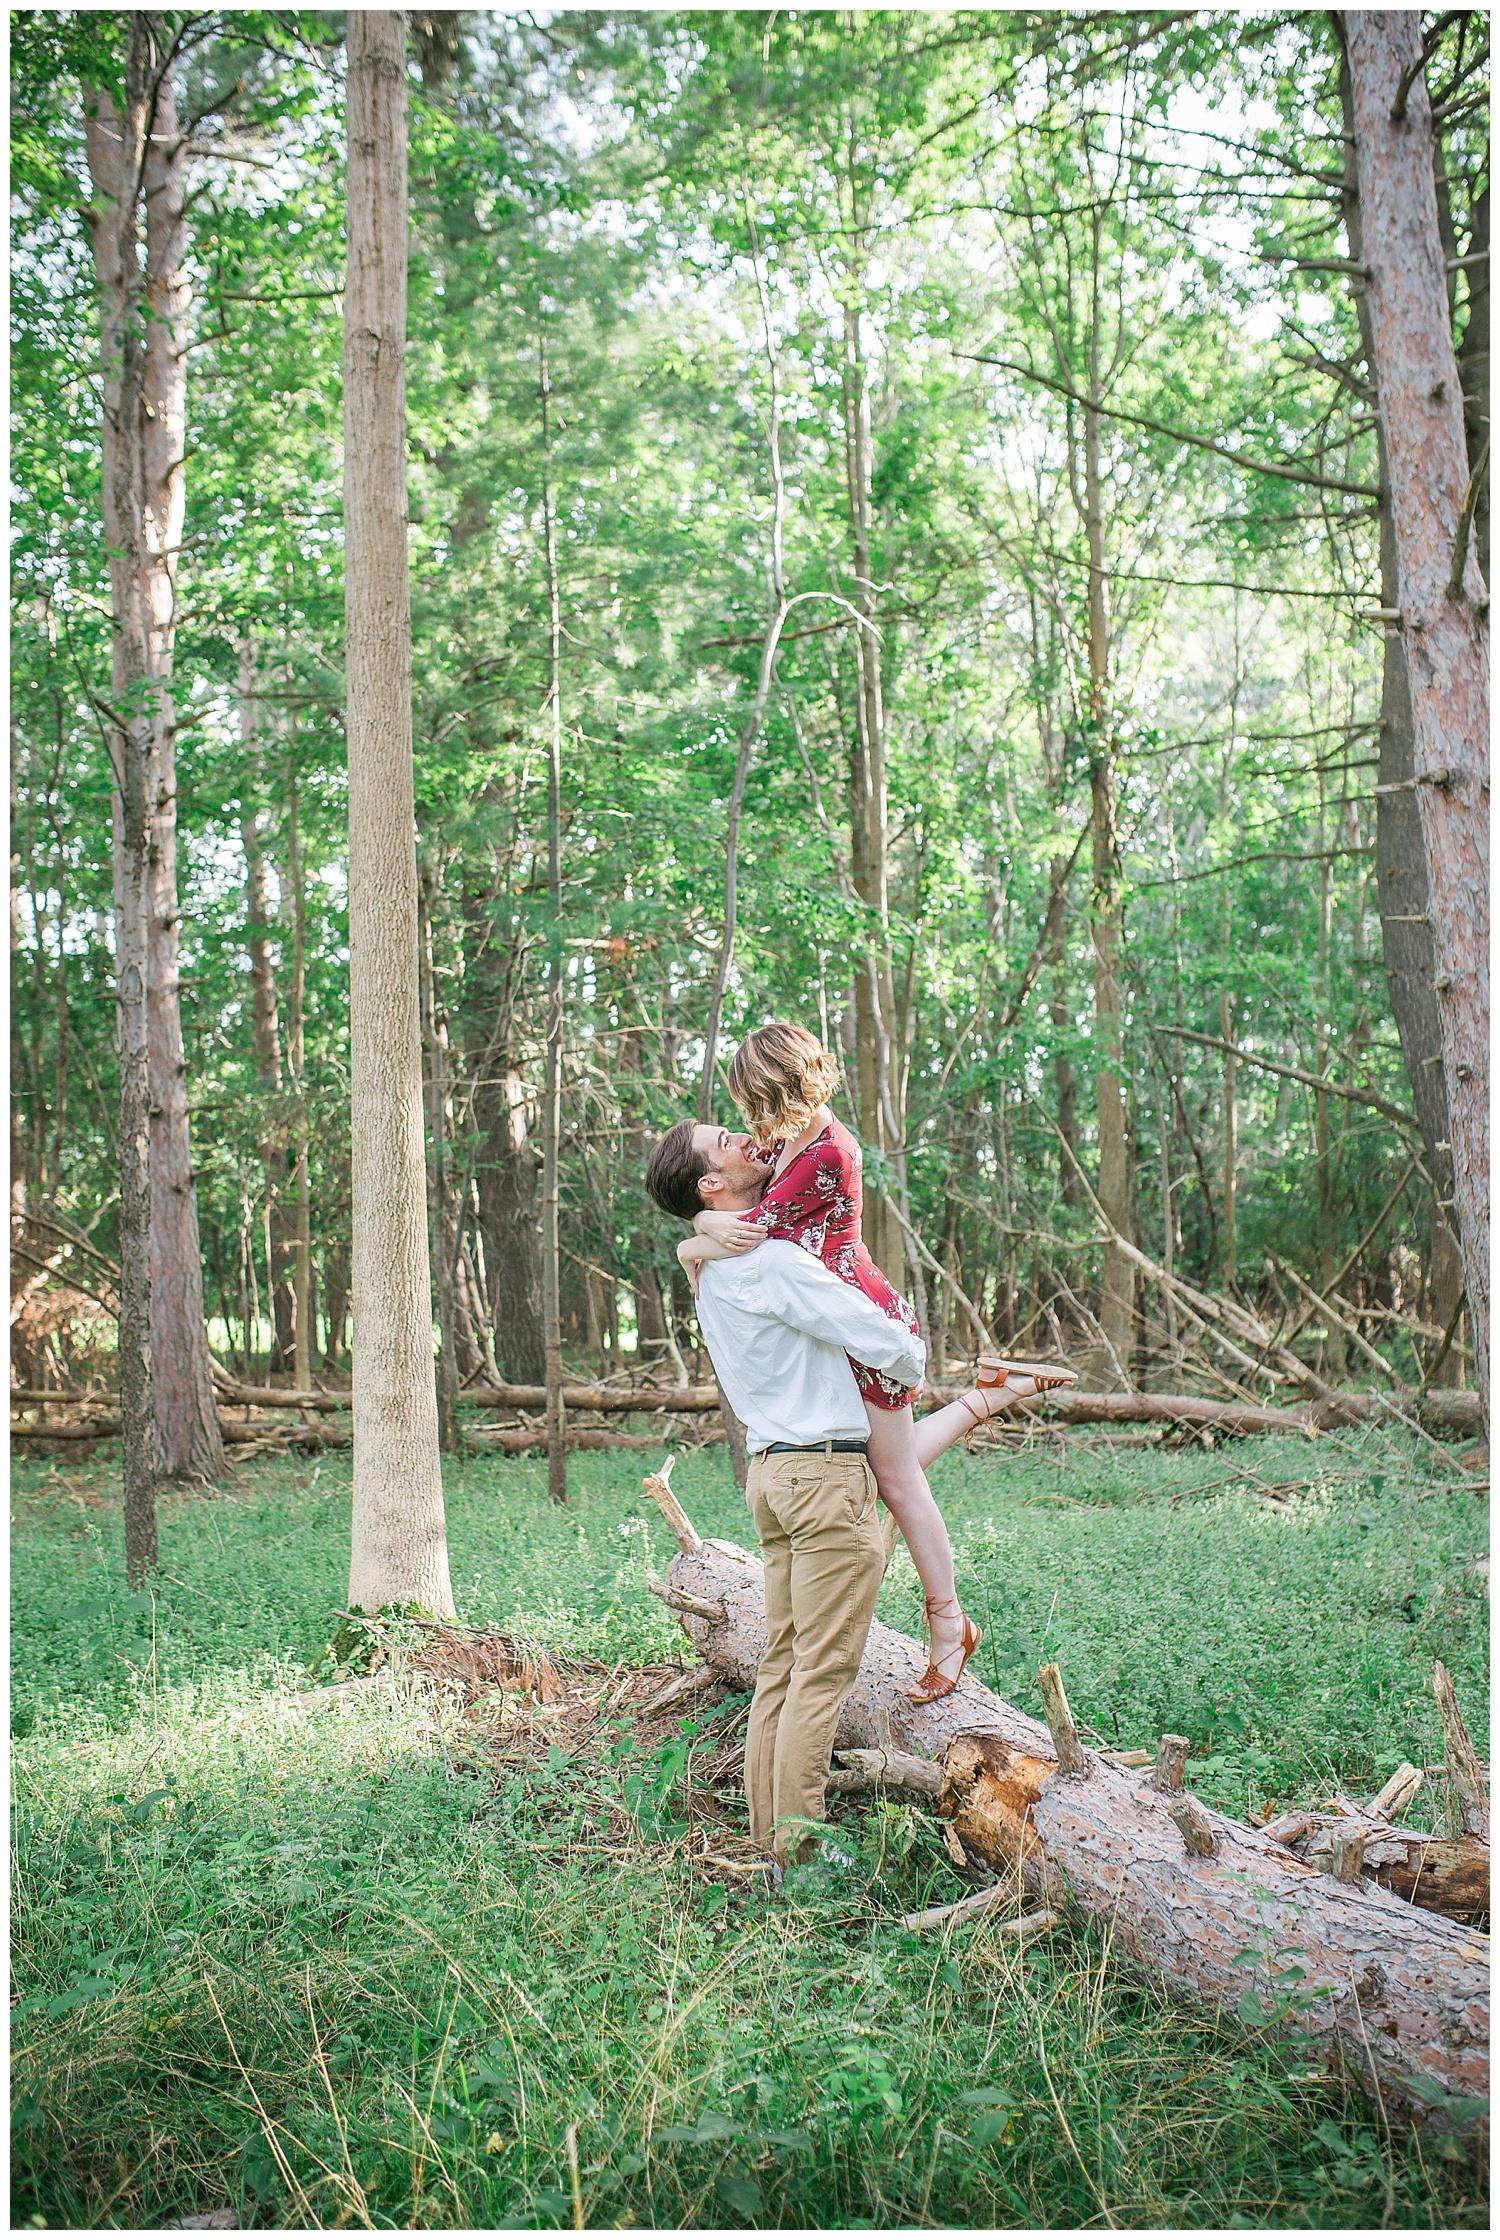 Tanya and Ryan - Sweetheart session - Lass & Beau - Geneseo NY-32_Buffalo wedding photography.jpg